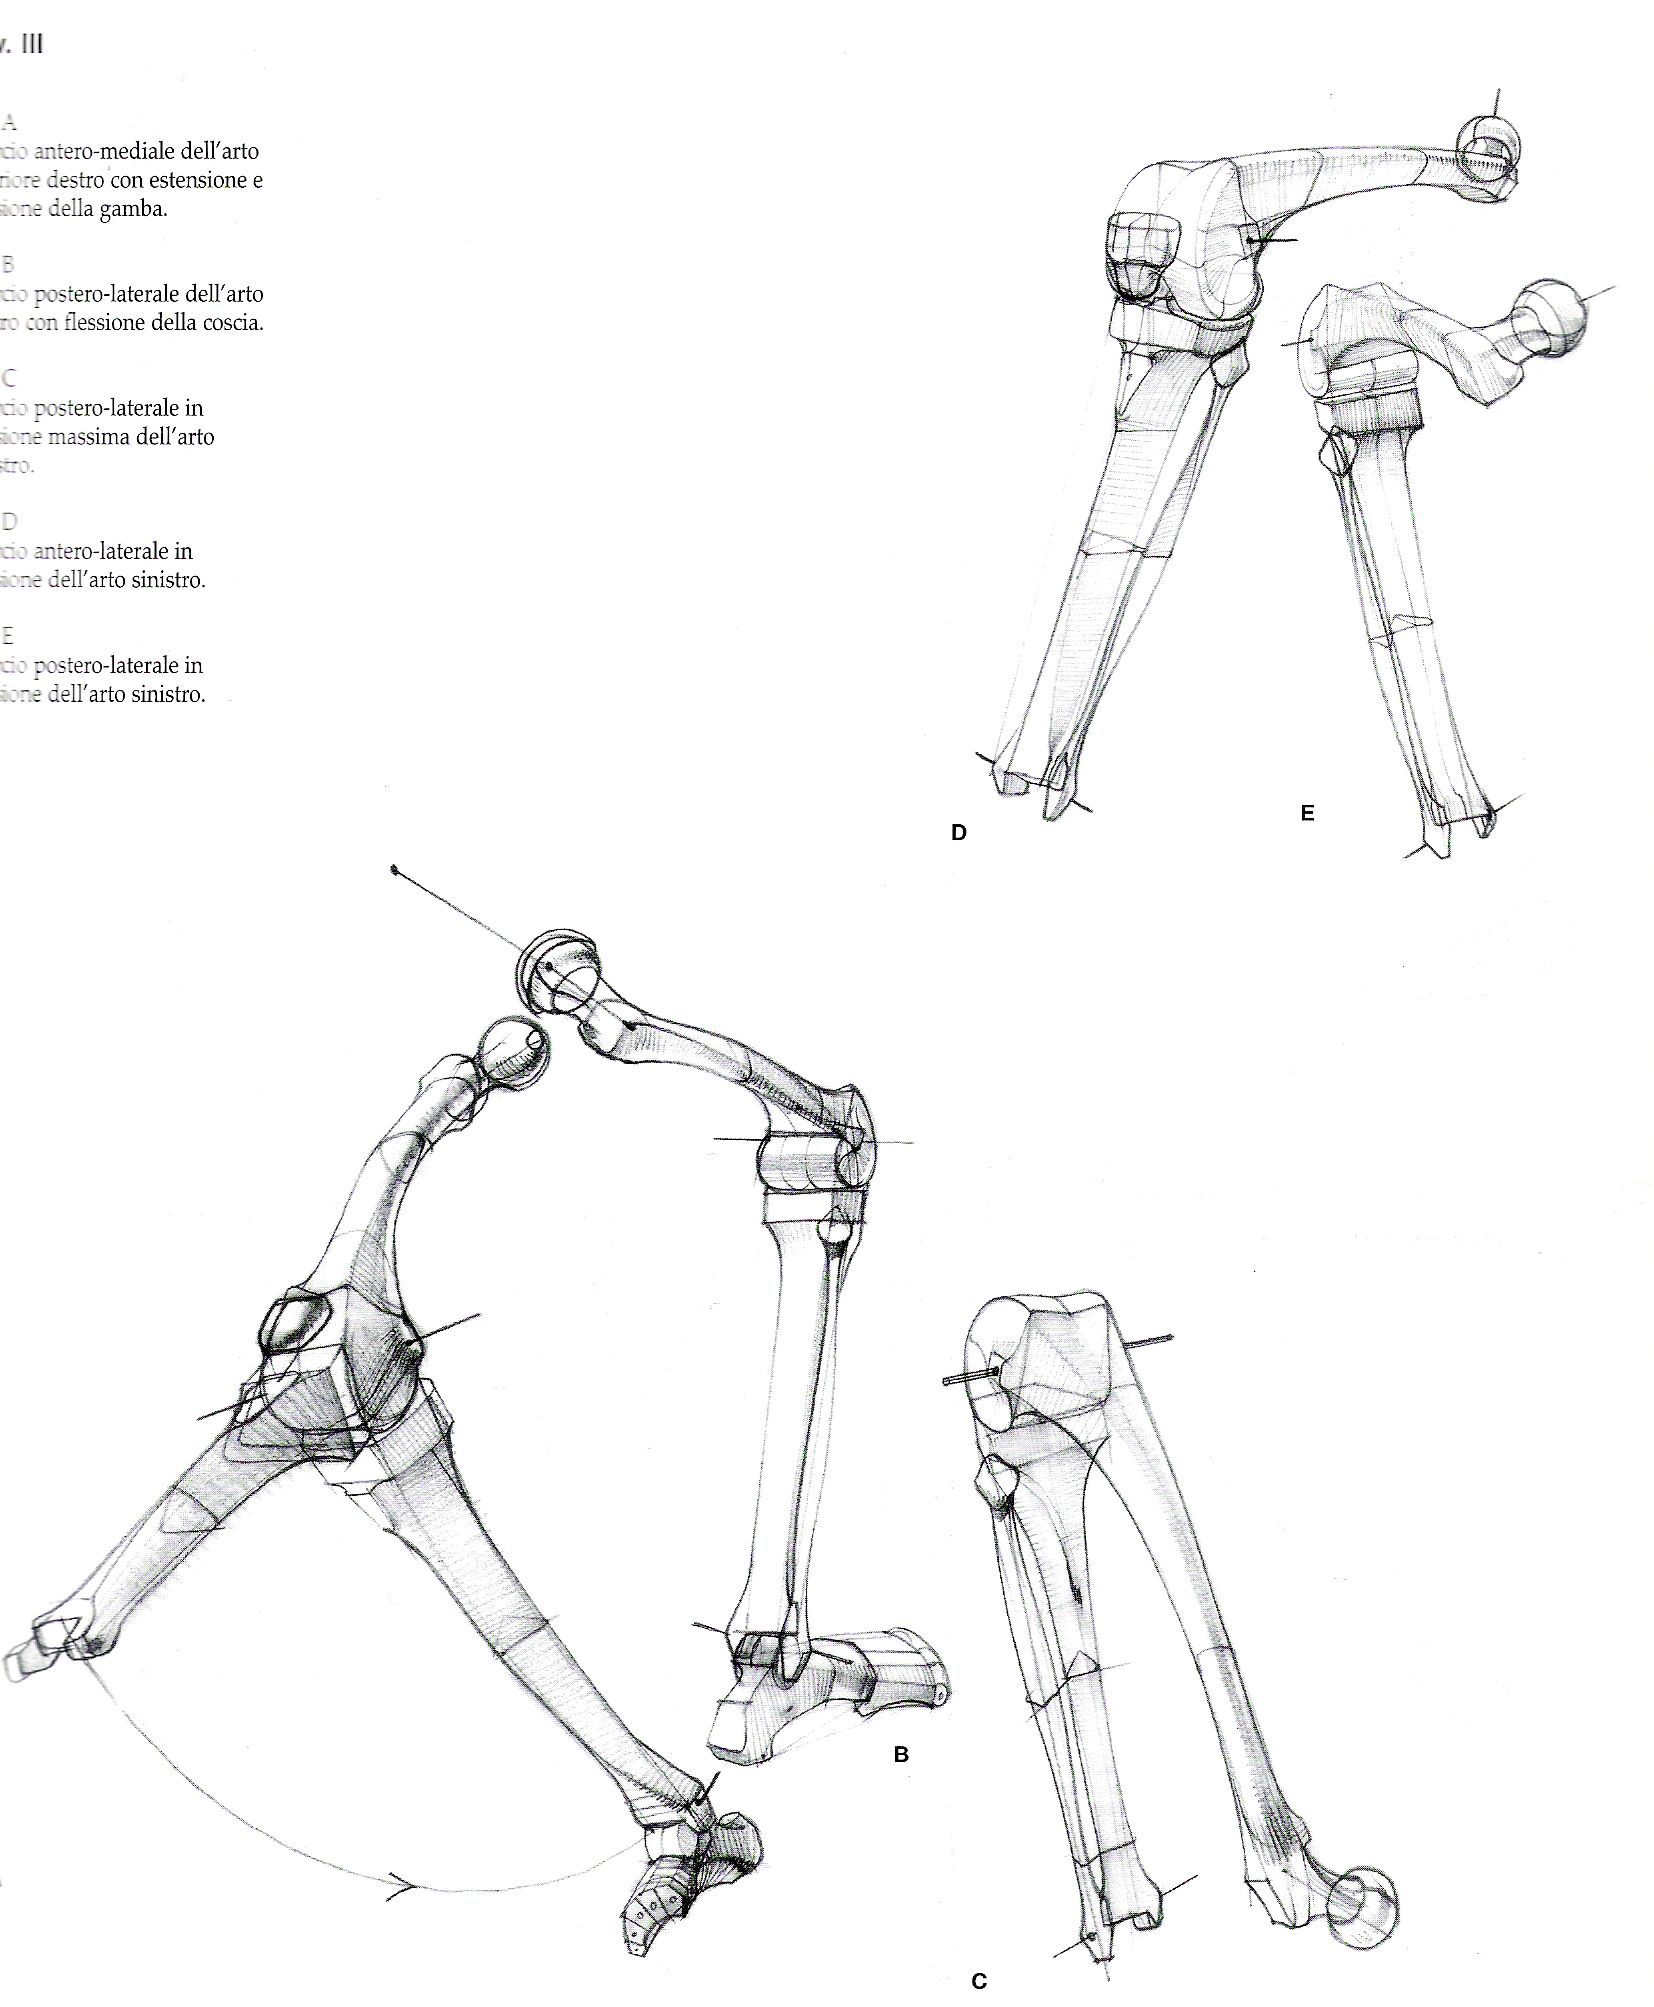 Bones * | Anatomia humana para artistas | Pinterest | Anatomía ...